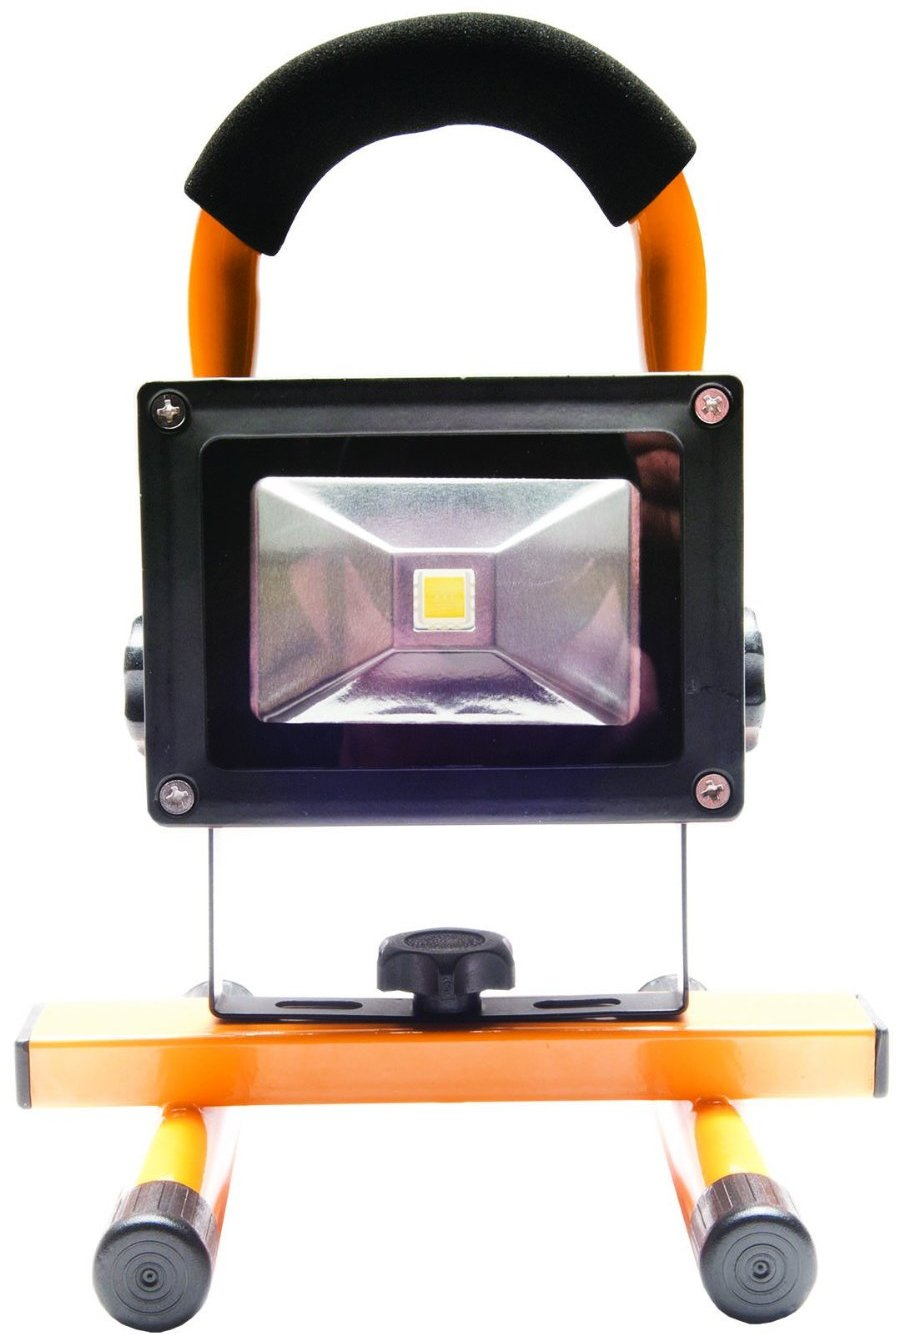 Olympia FL970 Rechargeable Waterproof LED Work Light, 970 Lumens